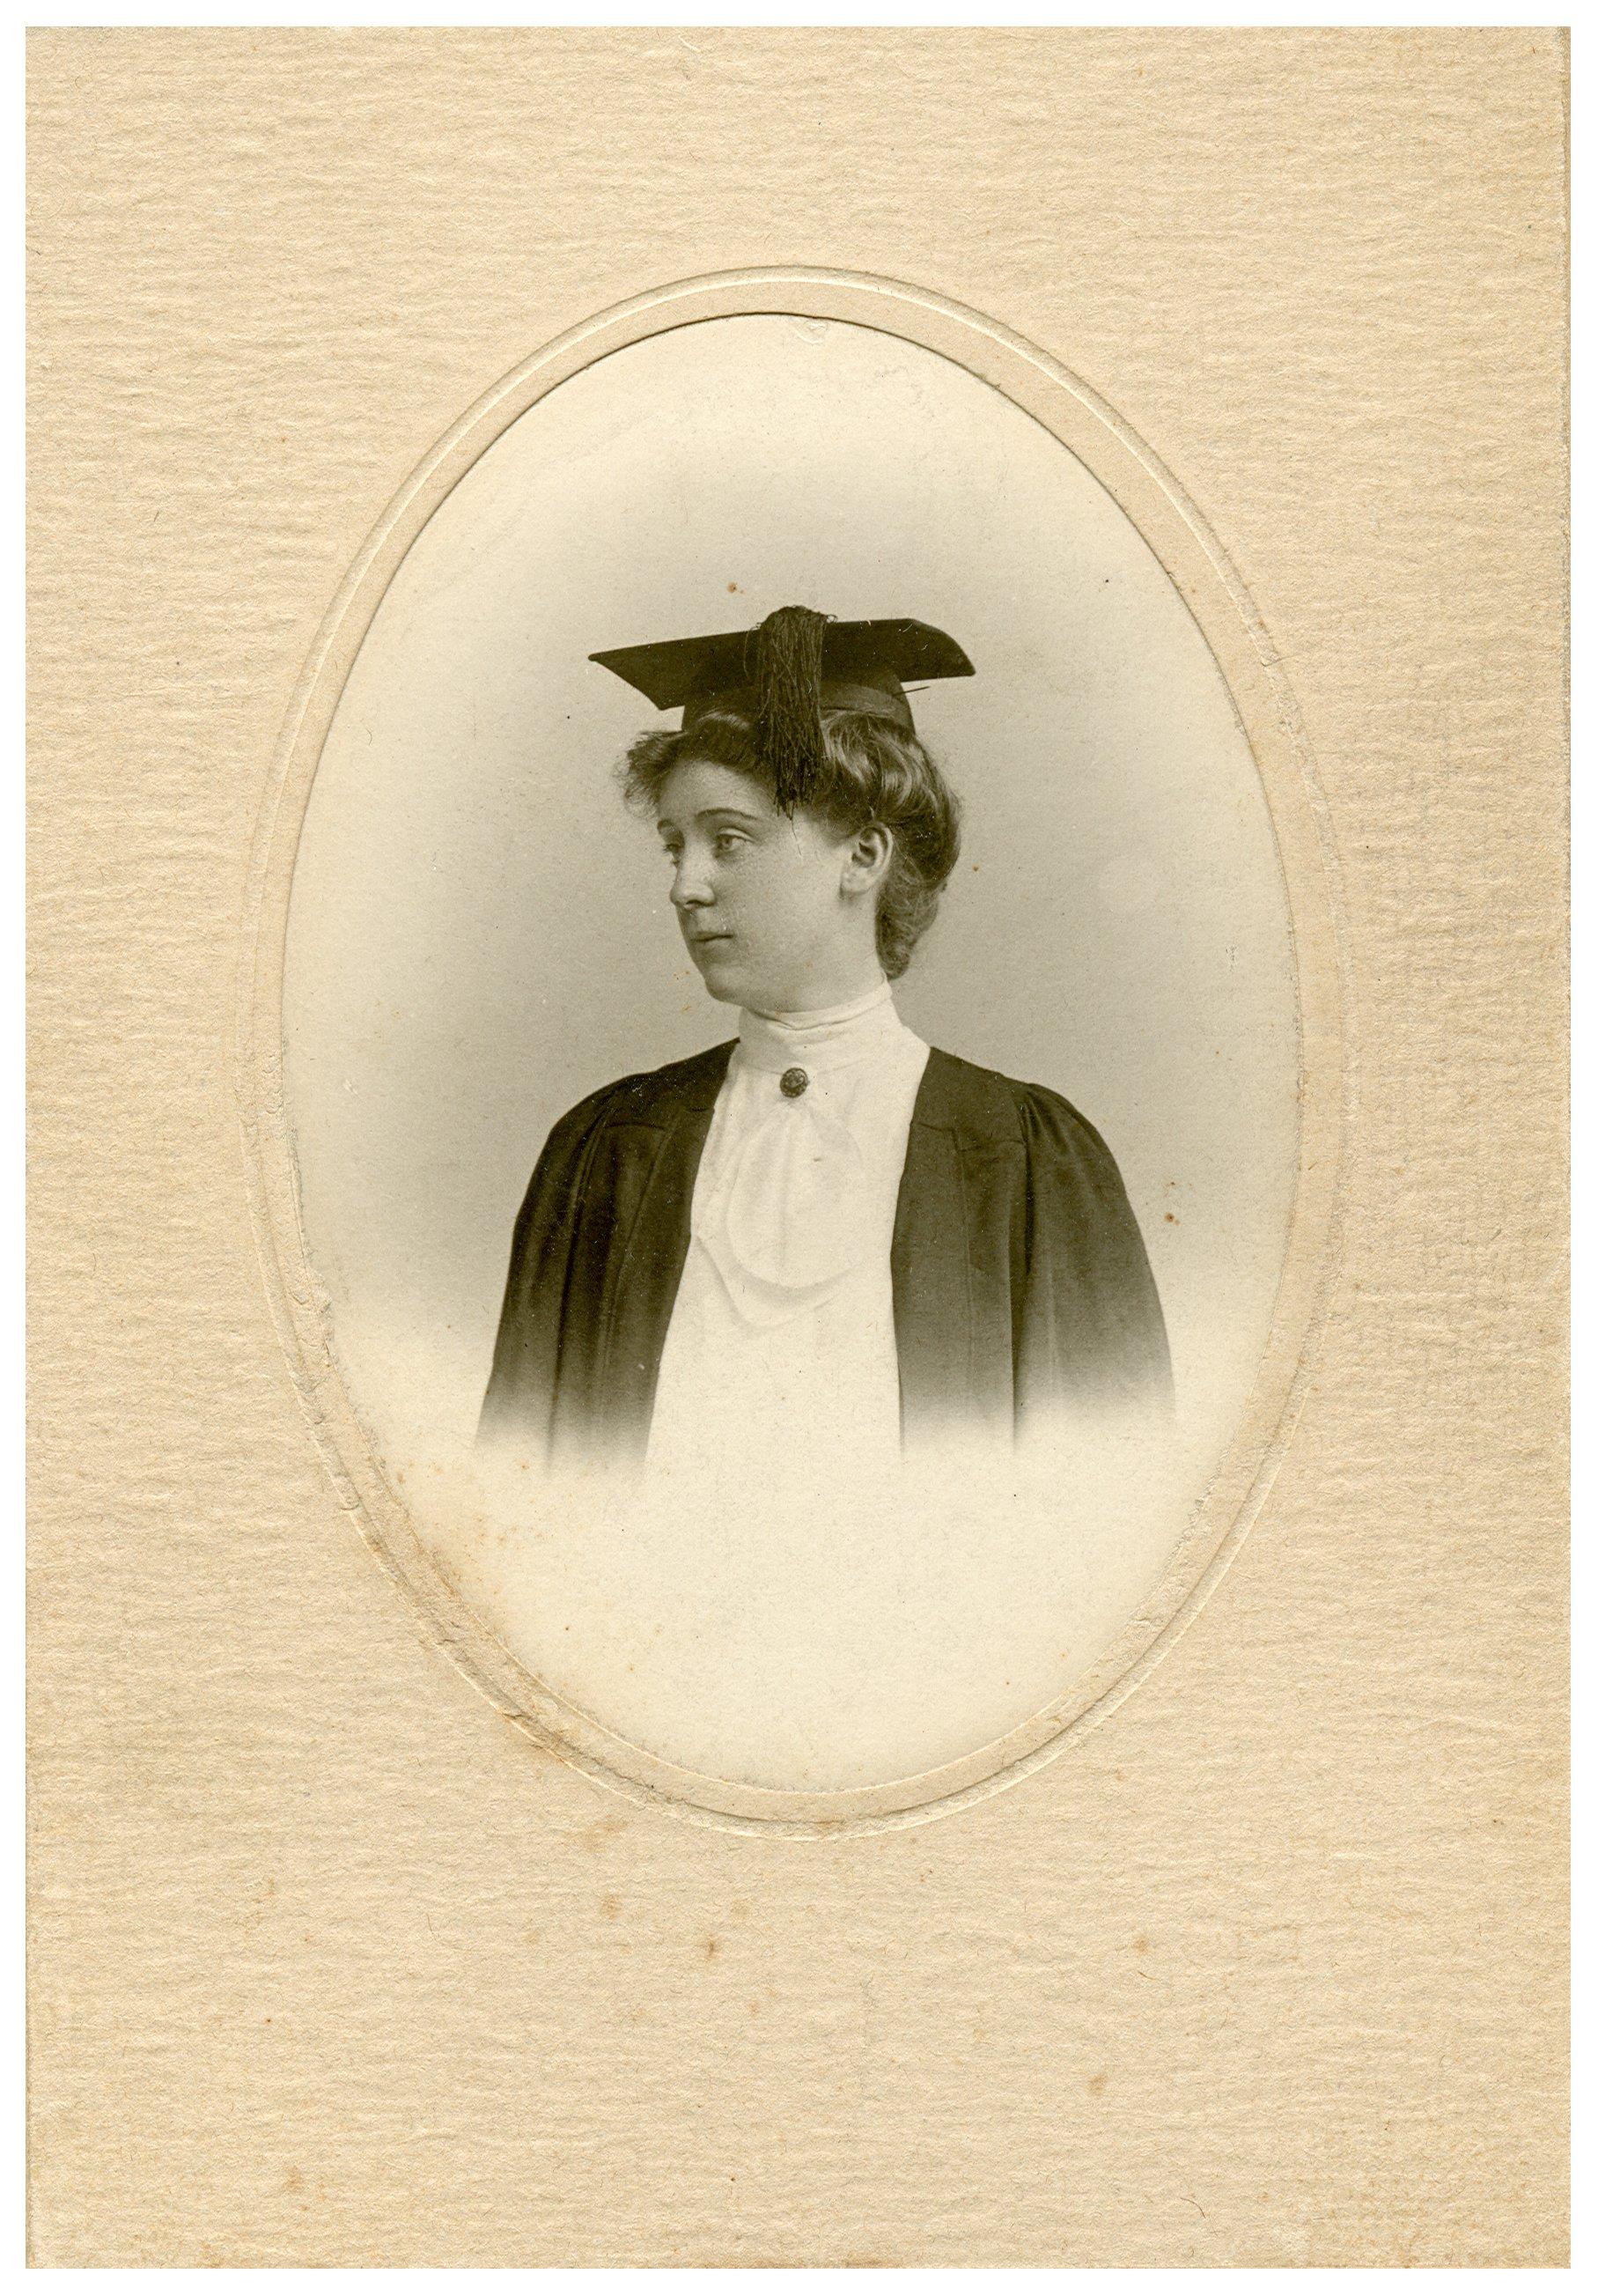 Margaret Wickliffe Preston (1885-1964) in a graduation cap and gown ...